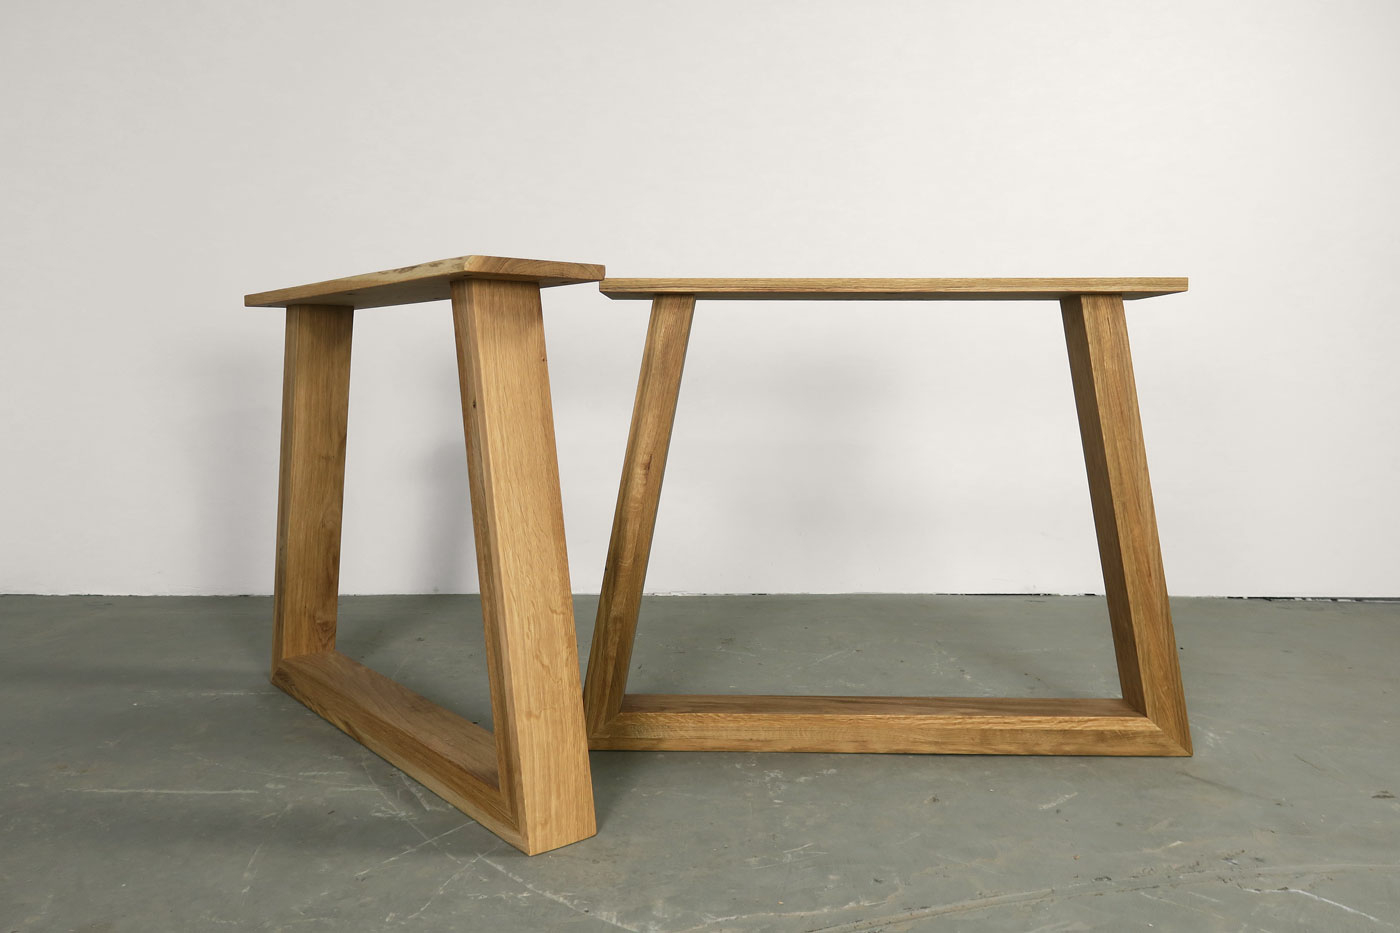 eiche tischgestell massiv kennet 2er set wohnsektion. Black Bedroom Furniture Sets. Home Design Ideas